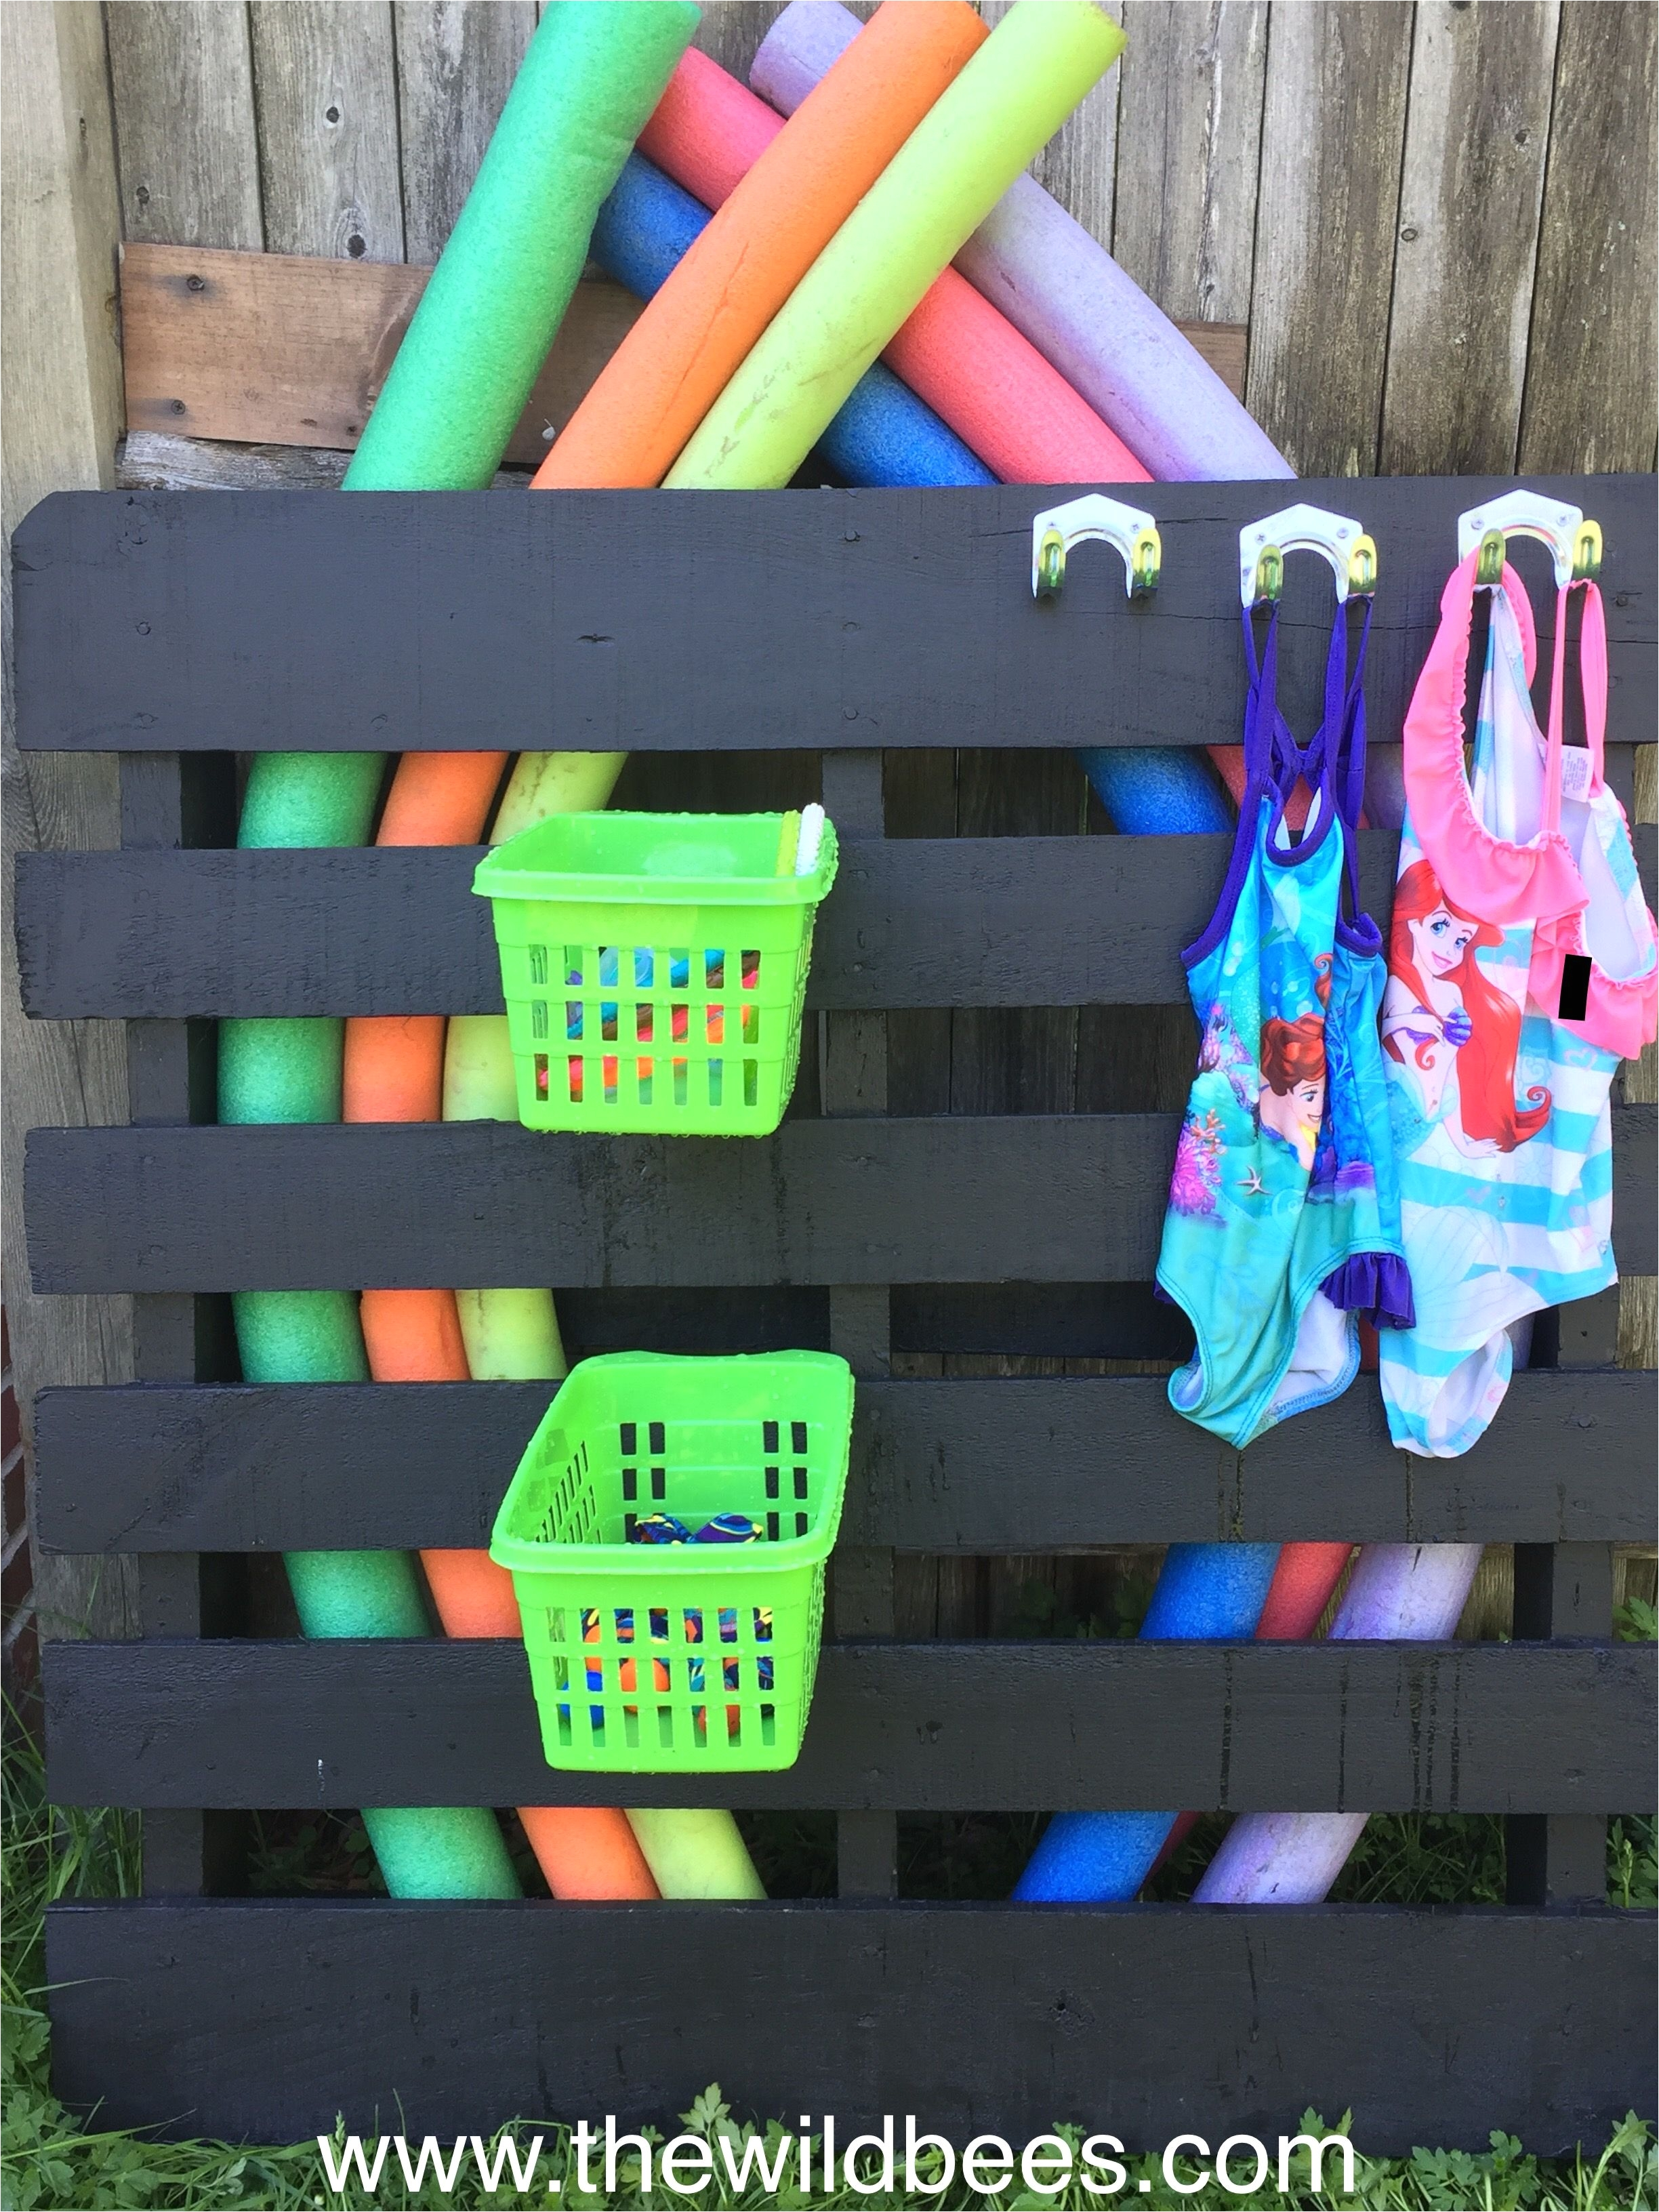 diy pool toys storage painted pallet dollar store baskets and hooks bee blake at